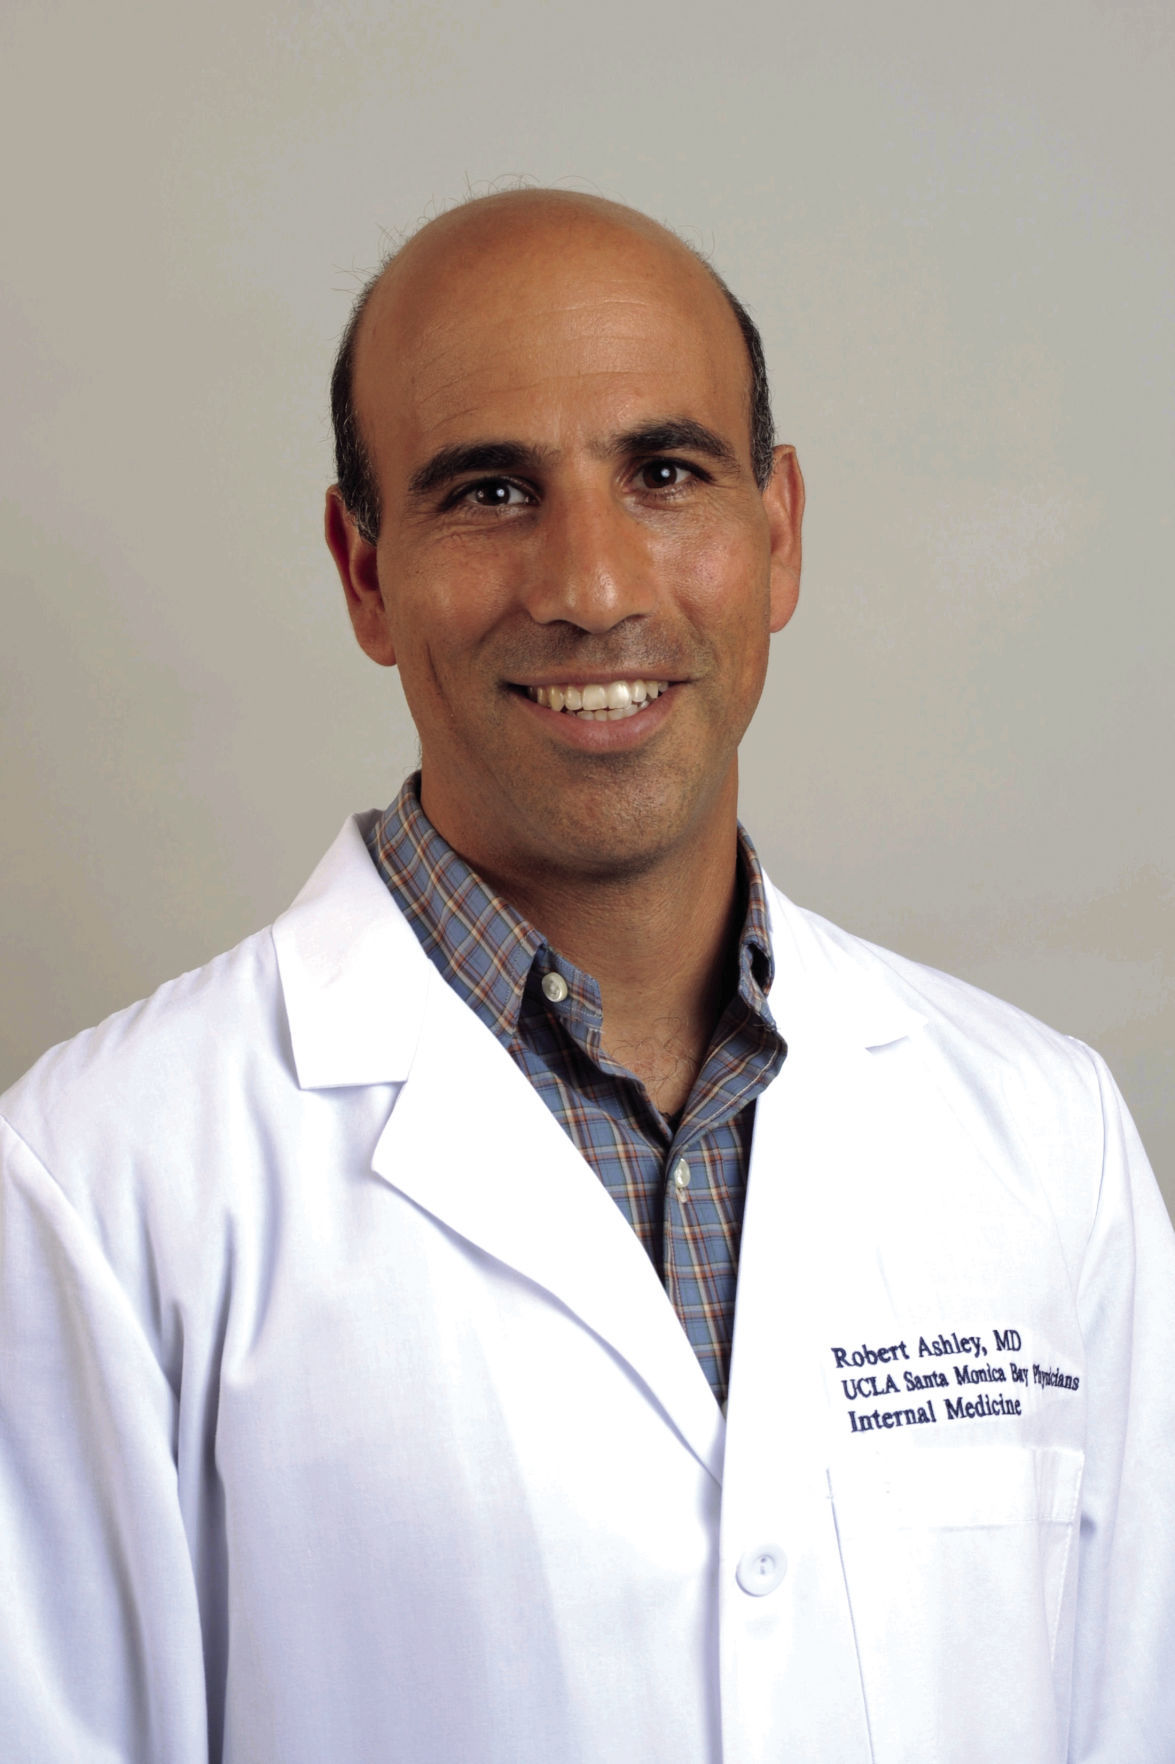 Dr. Robert Ashley M.D.